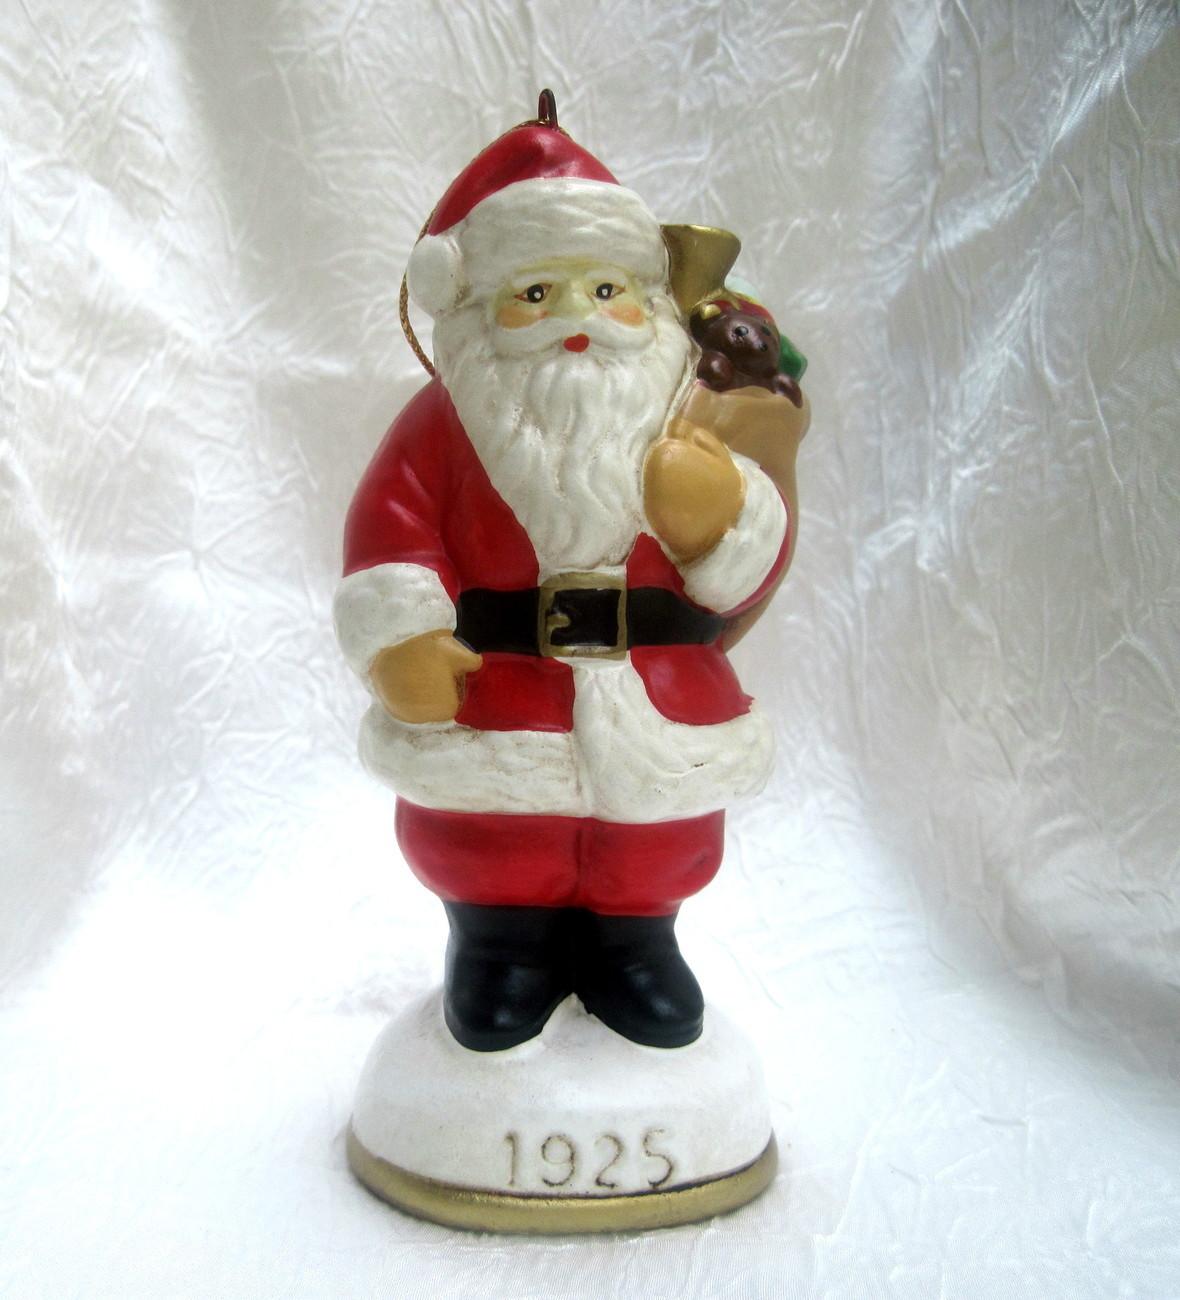 Christmas eve santa claus figurine ornament